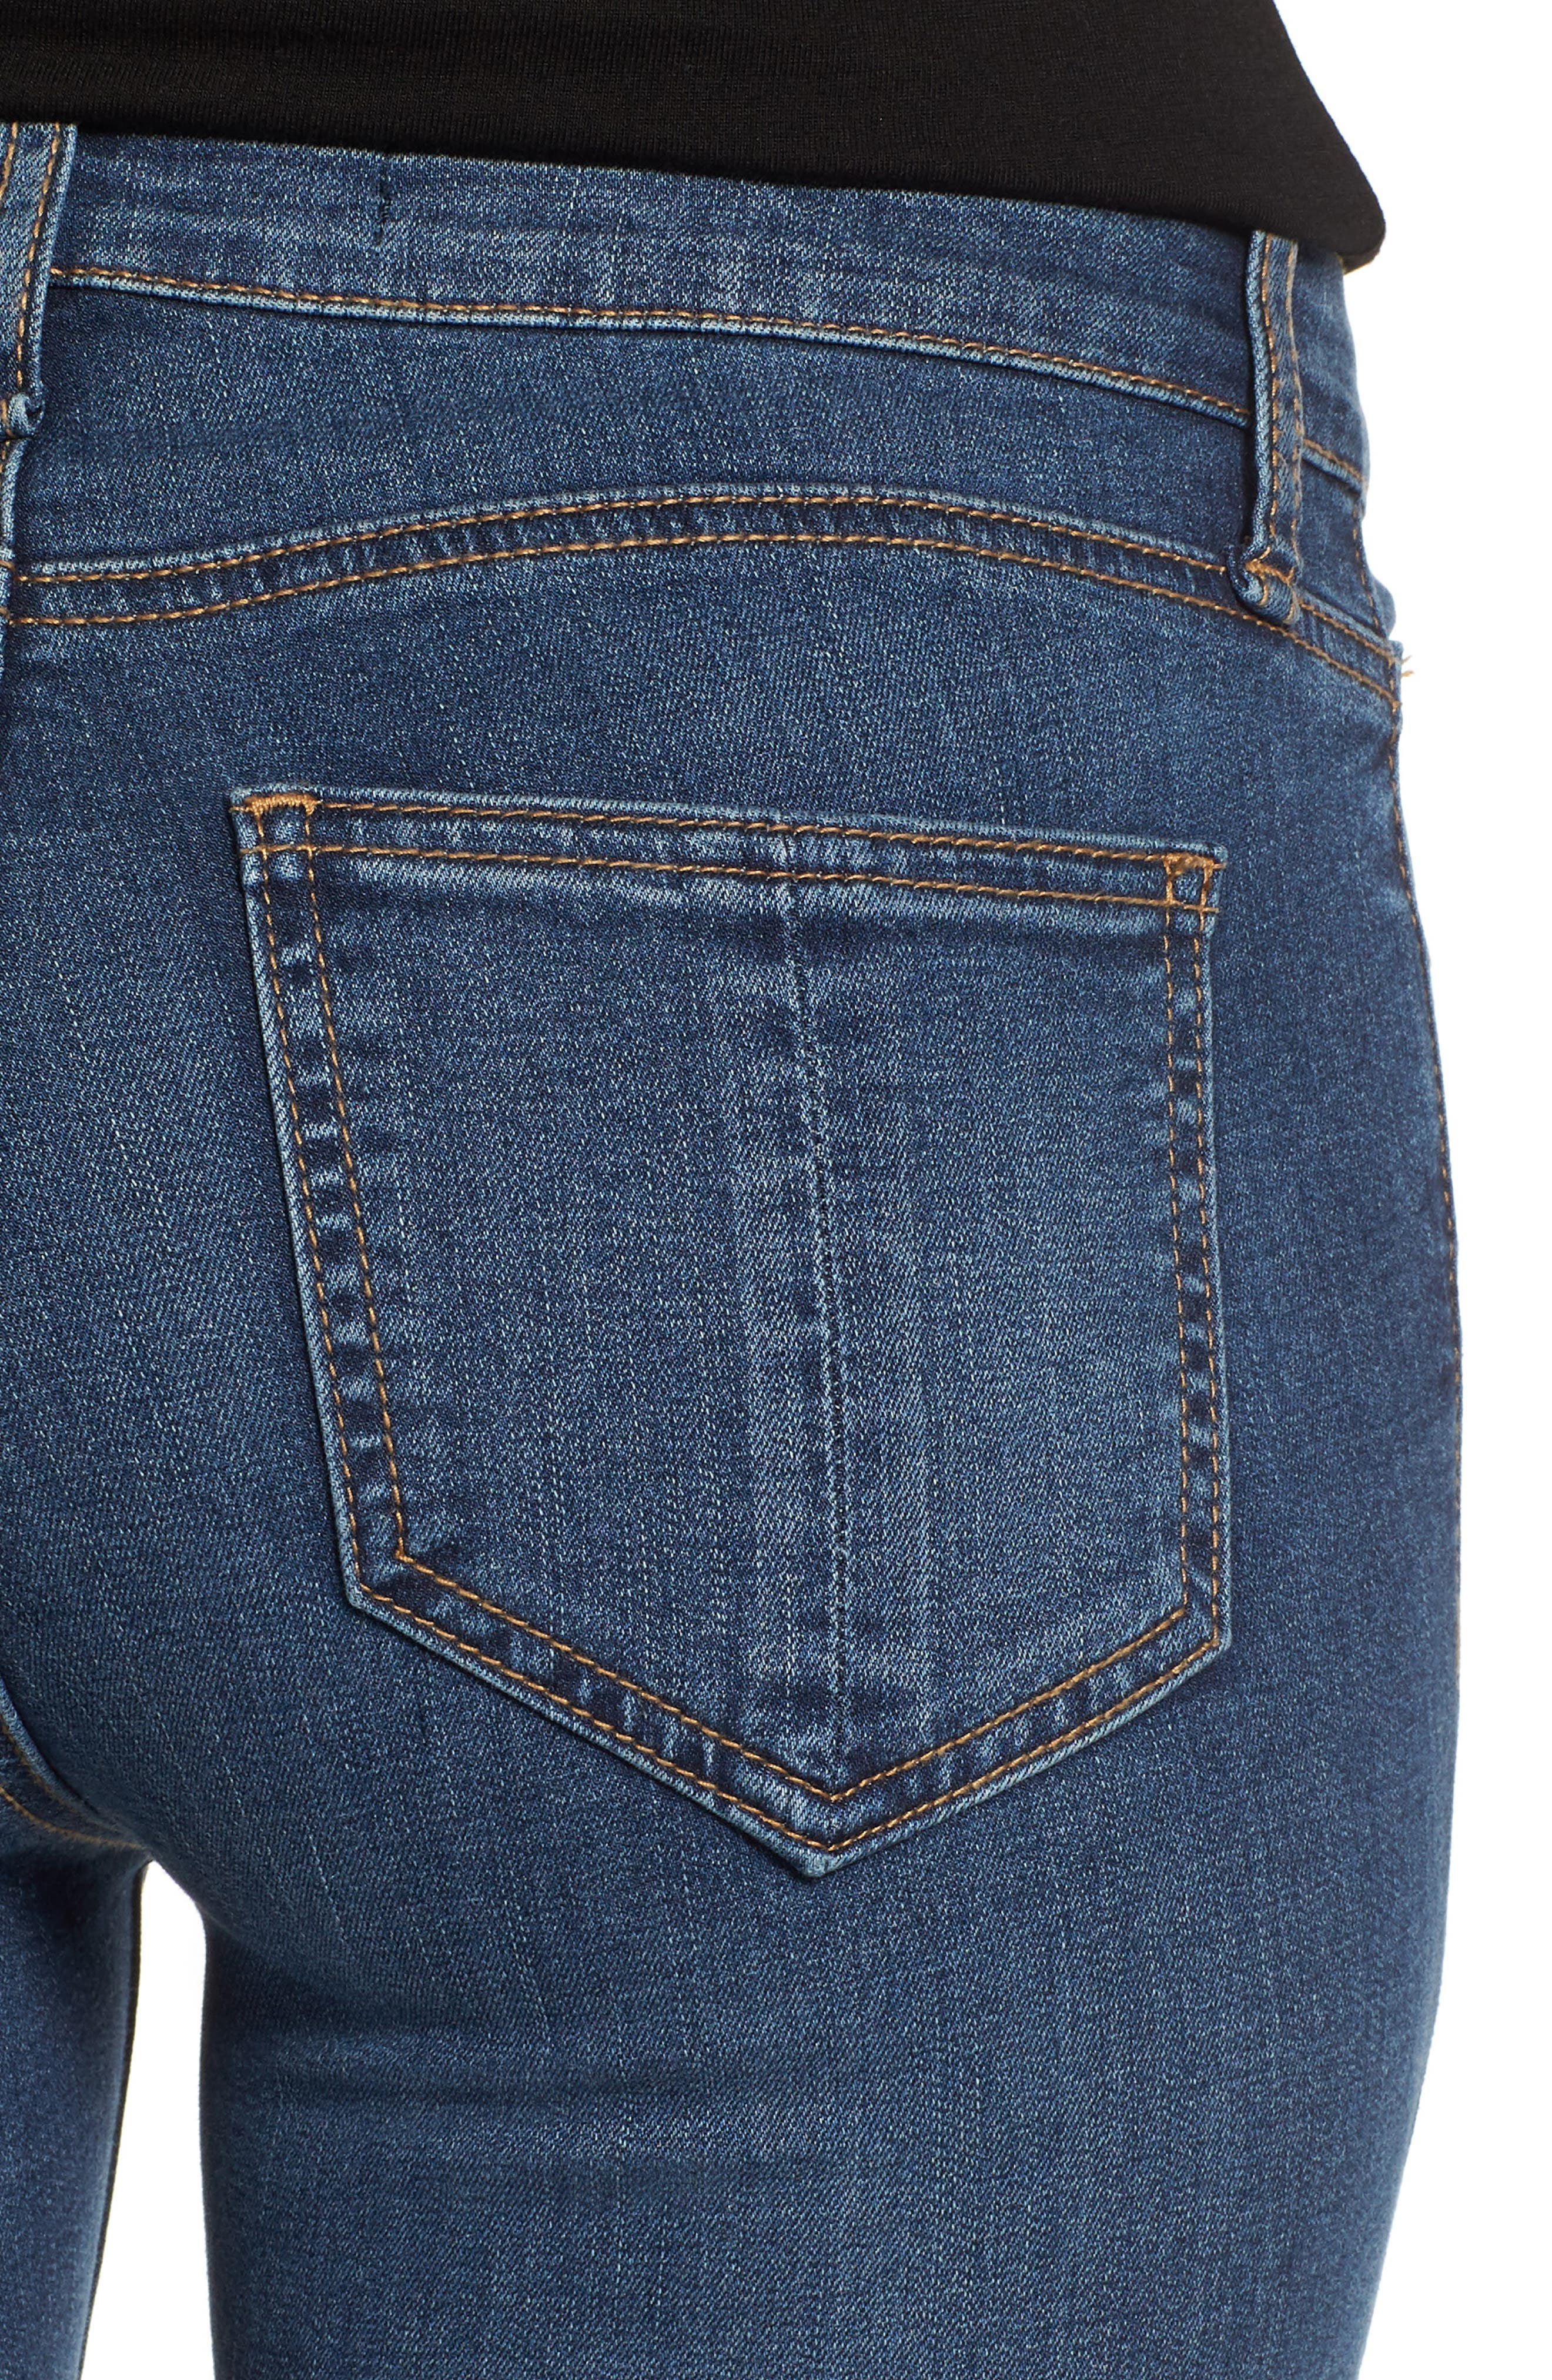 Skinny Jeans,                             Alternate thumbnail 4, color,